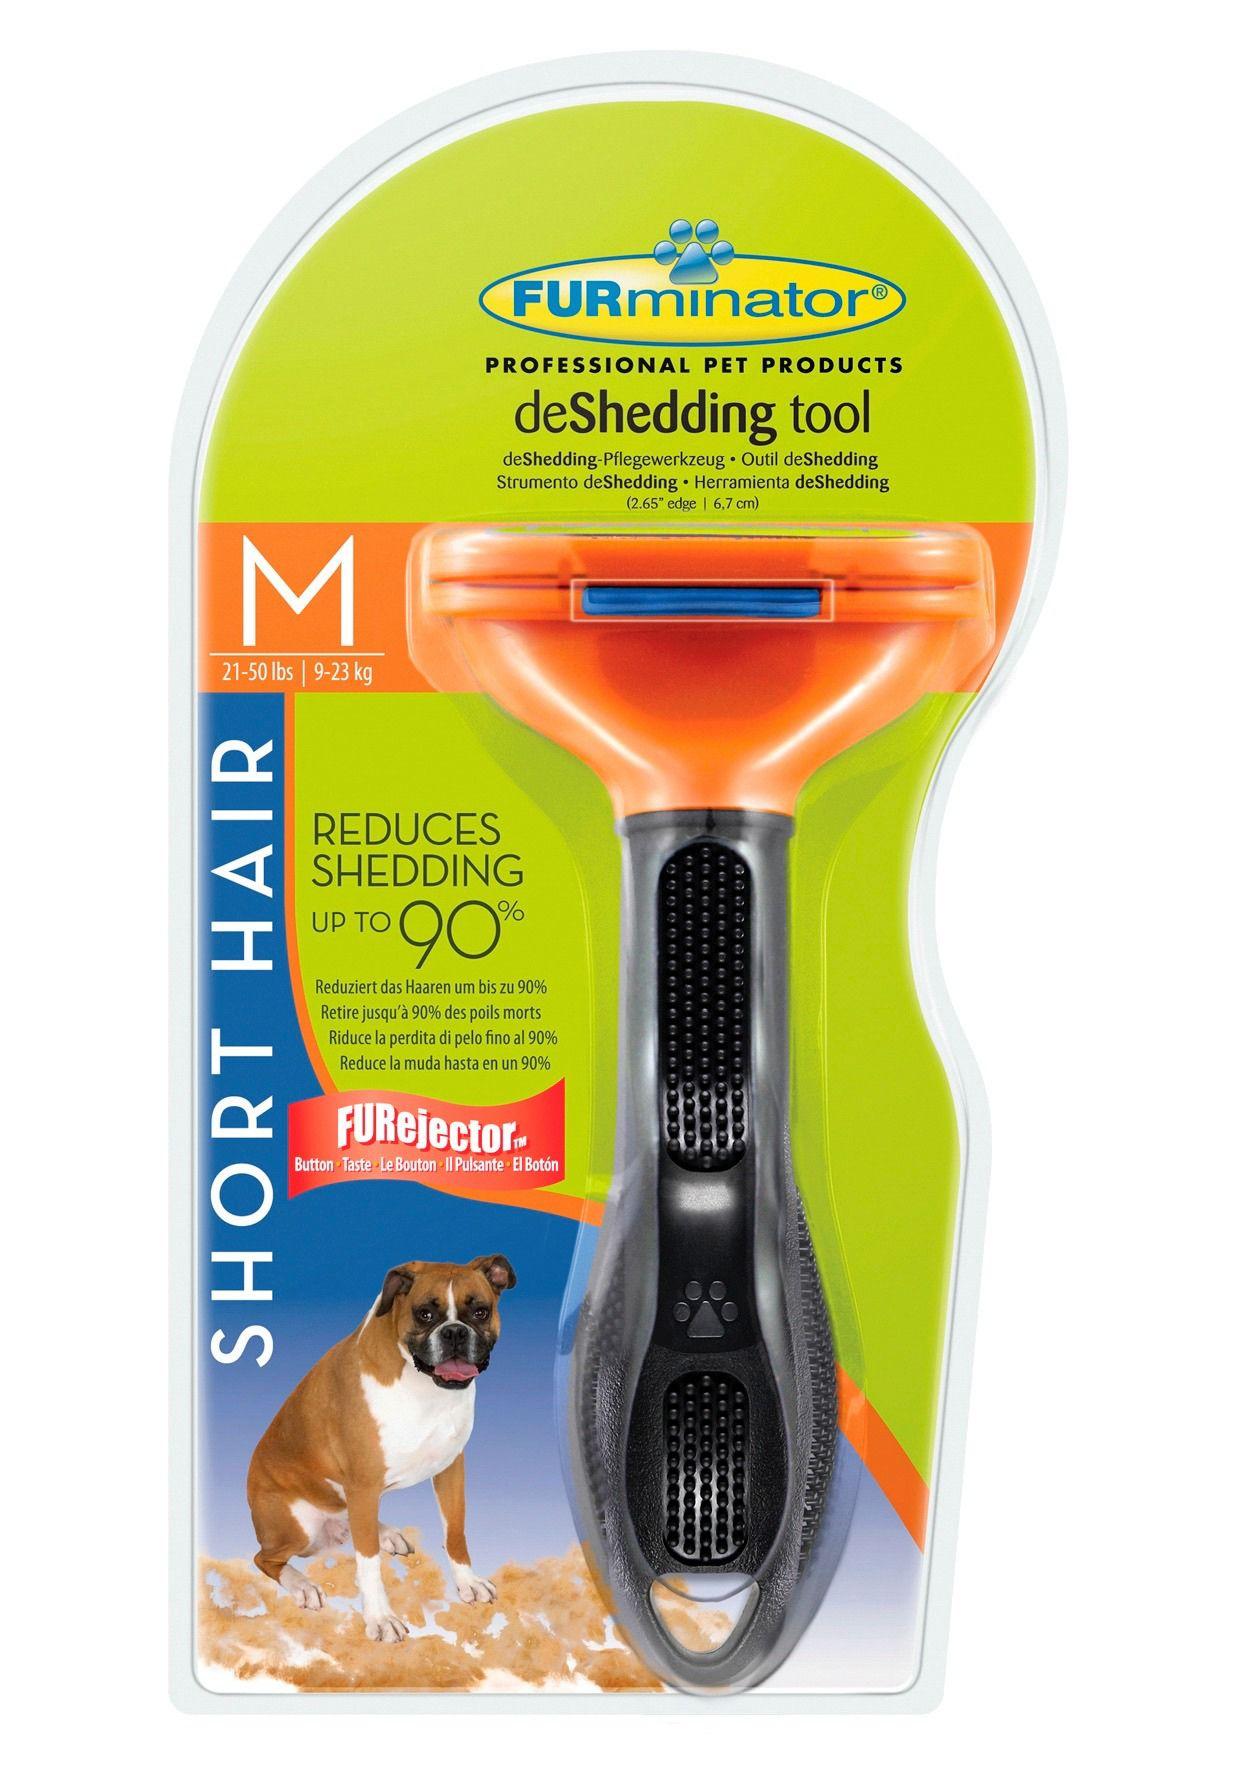 FURMINATOR Hunde-Pflegebürste »FURminator deShedding Kurzhaar M«